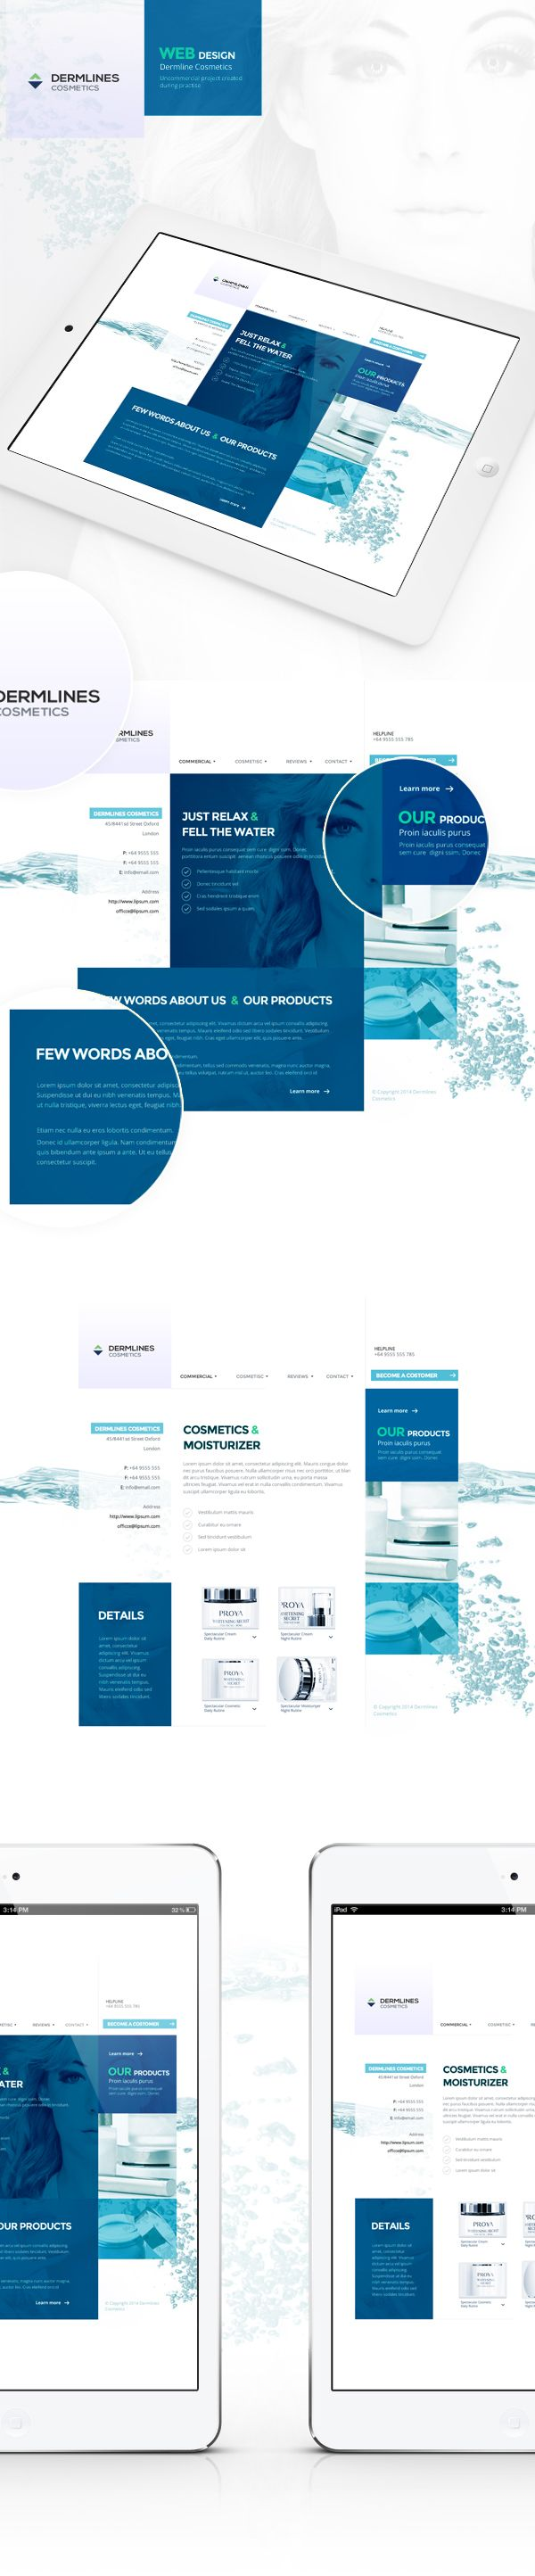 Web design for Cosmetics Industry by Katarzyna Dalkowska, via Behance